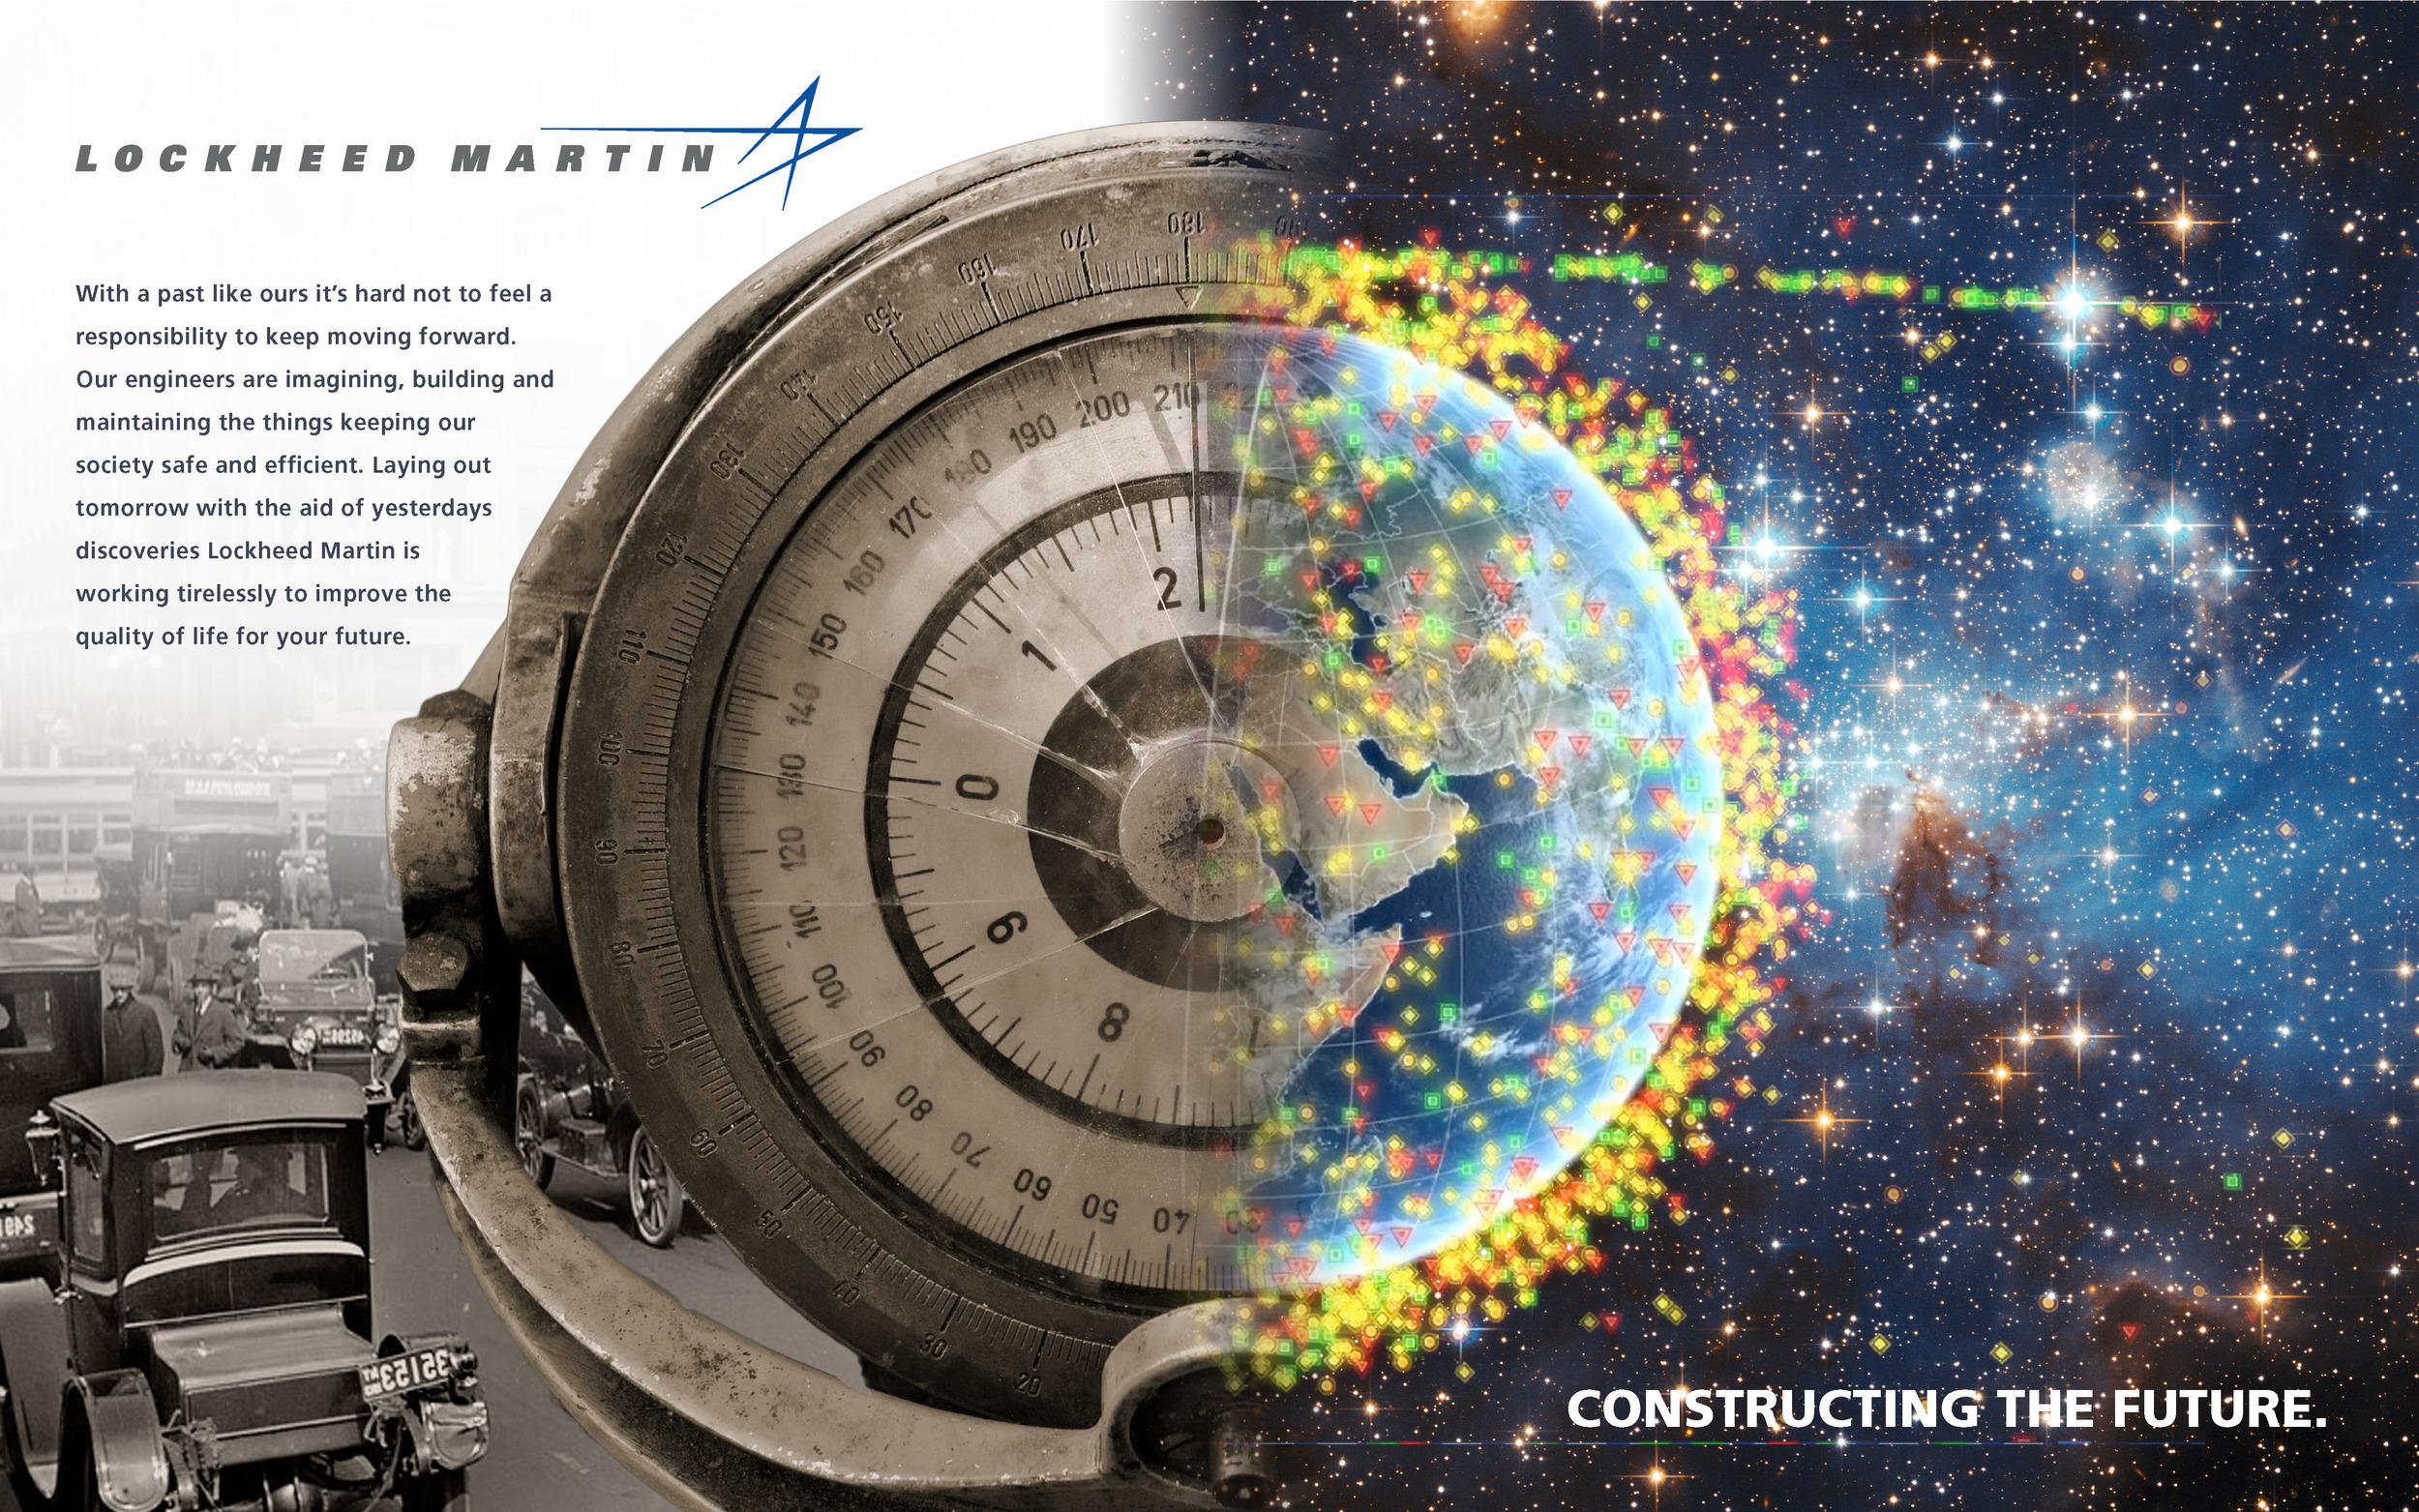 Lockheed Martin Magazine.jpg